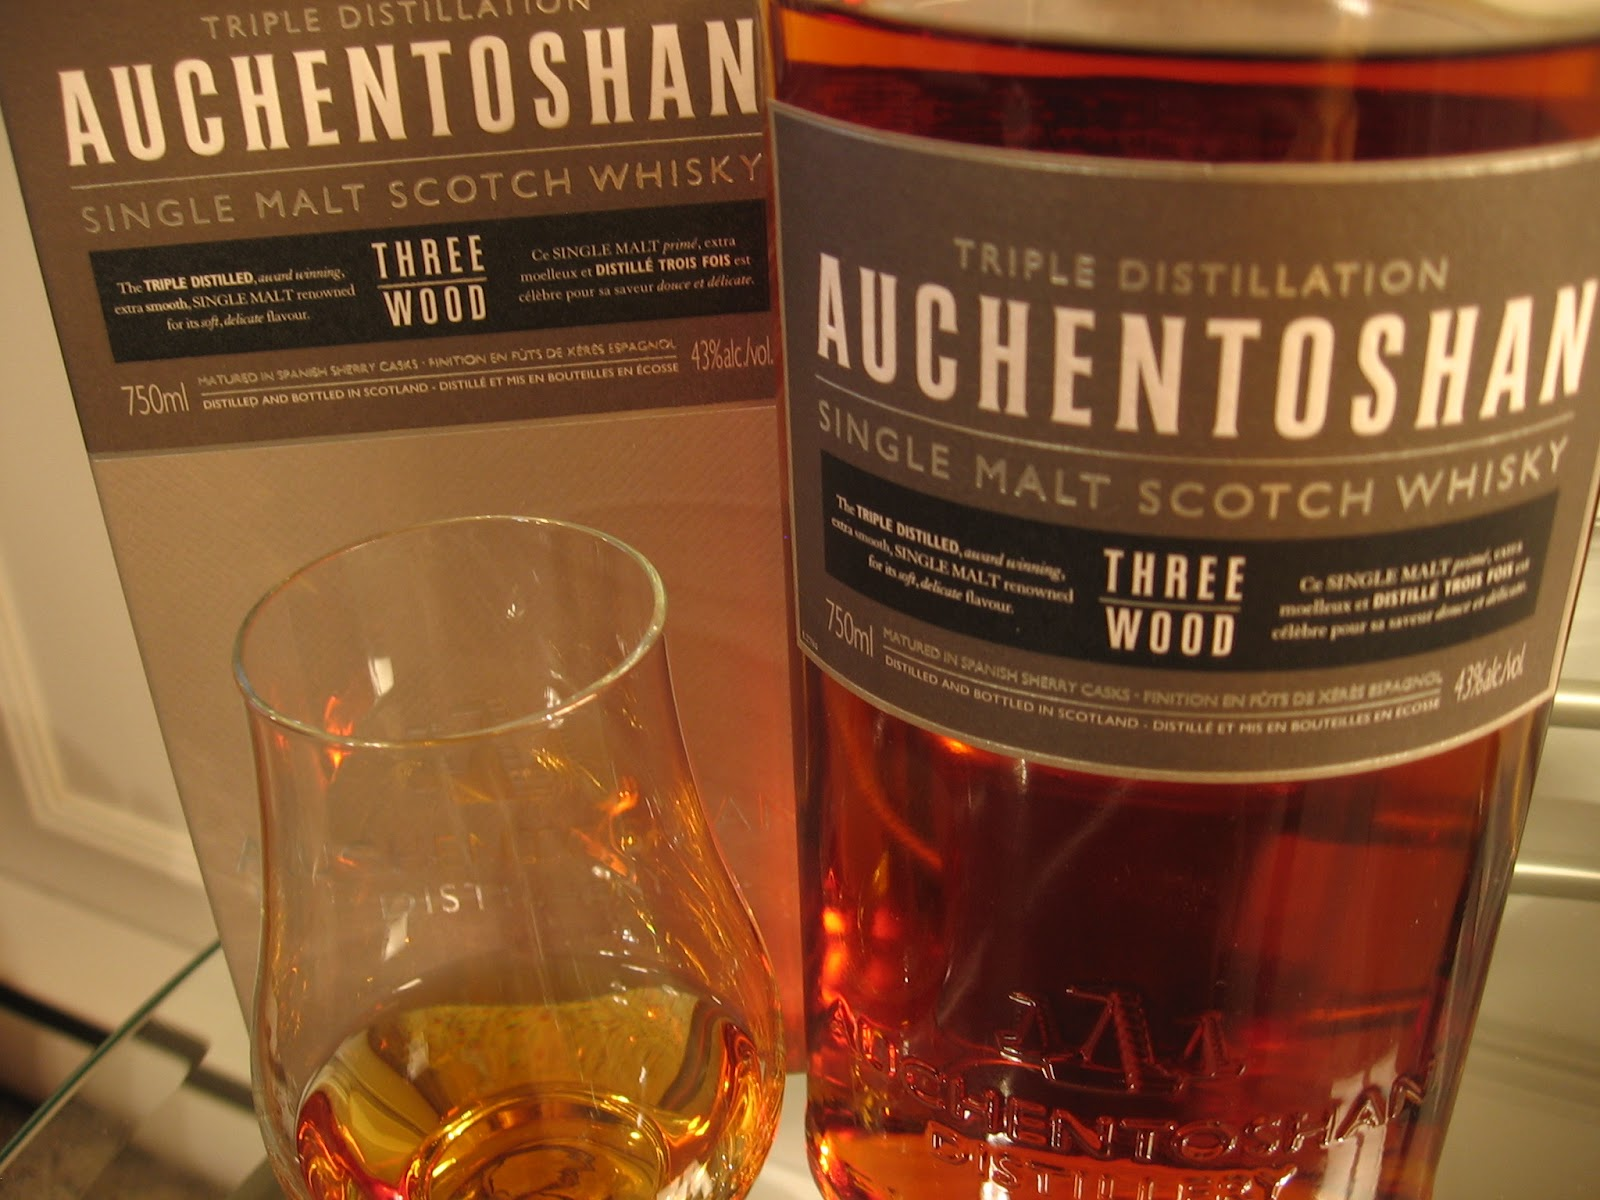 Auchentoshan Three Wood – single malt scotch